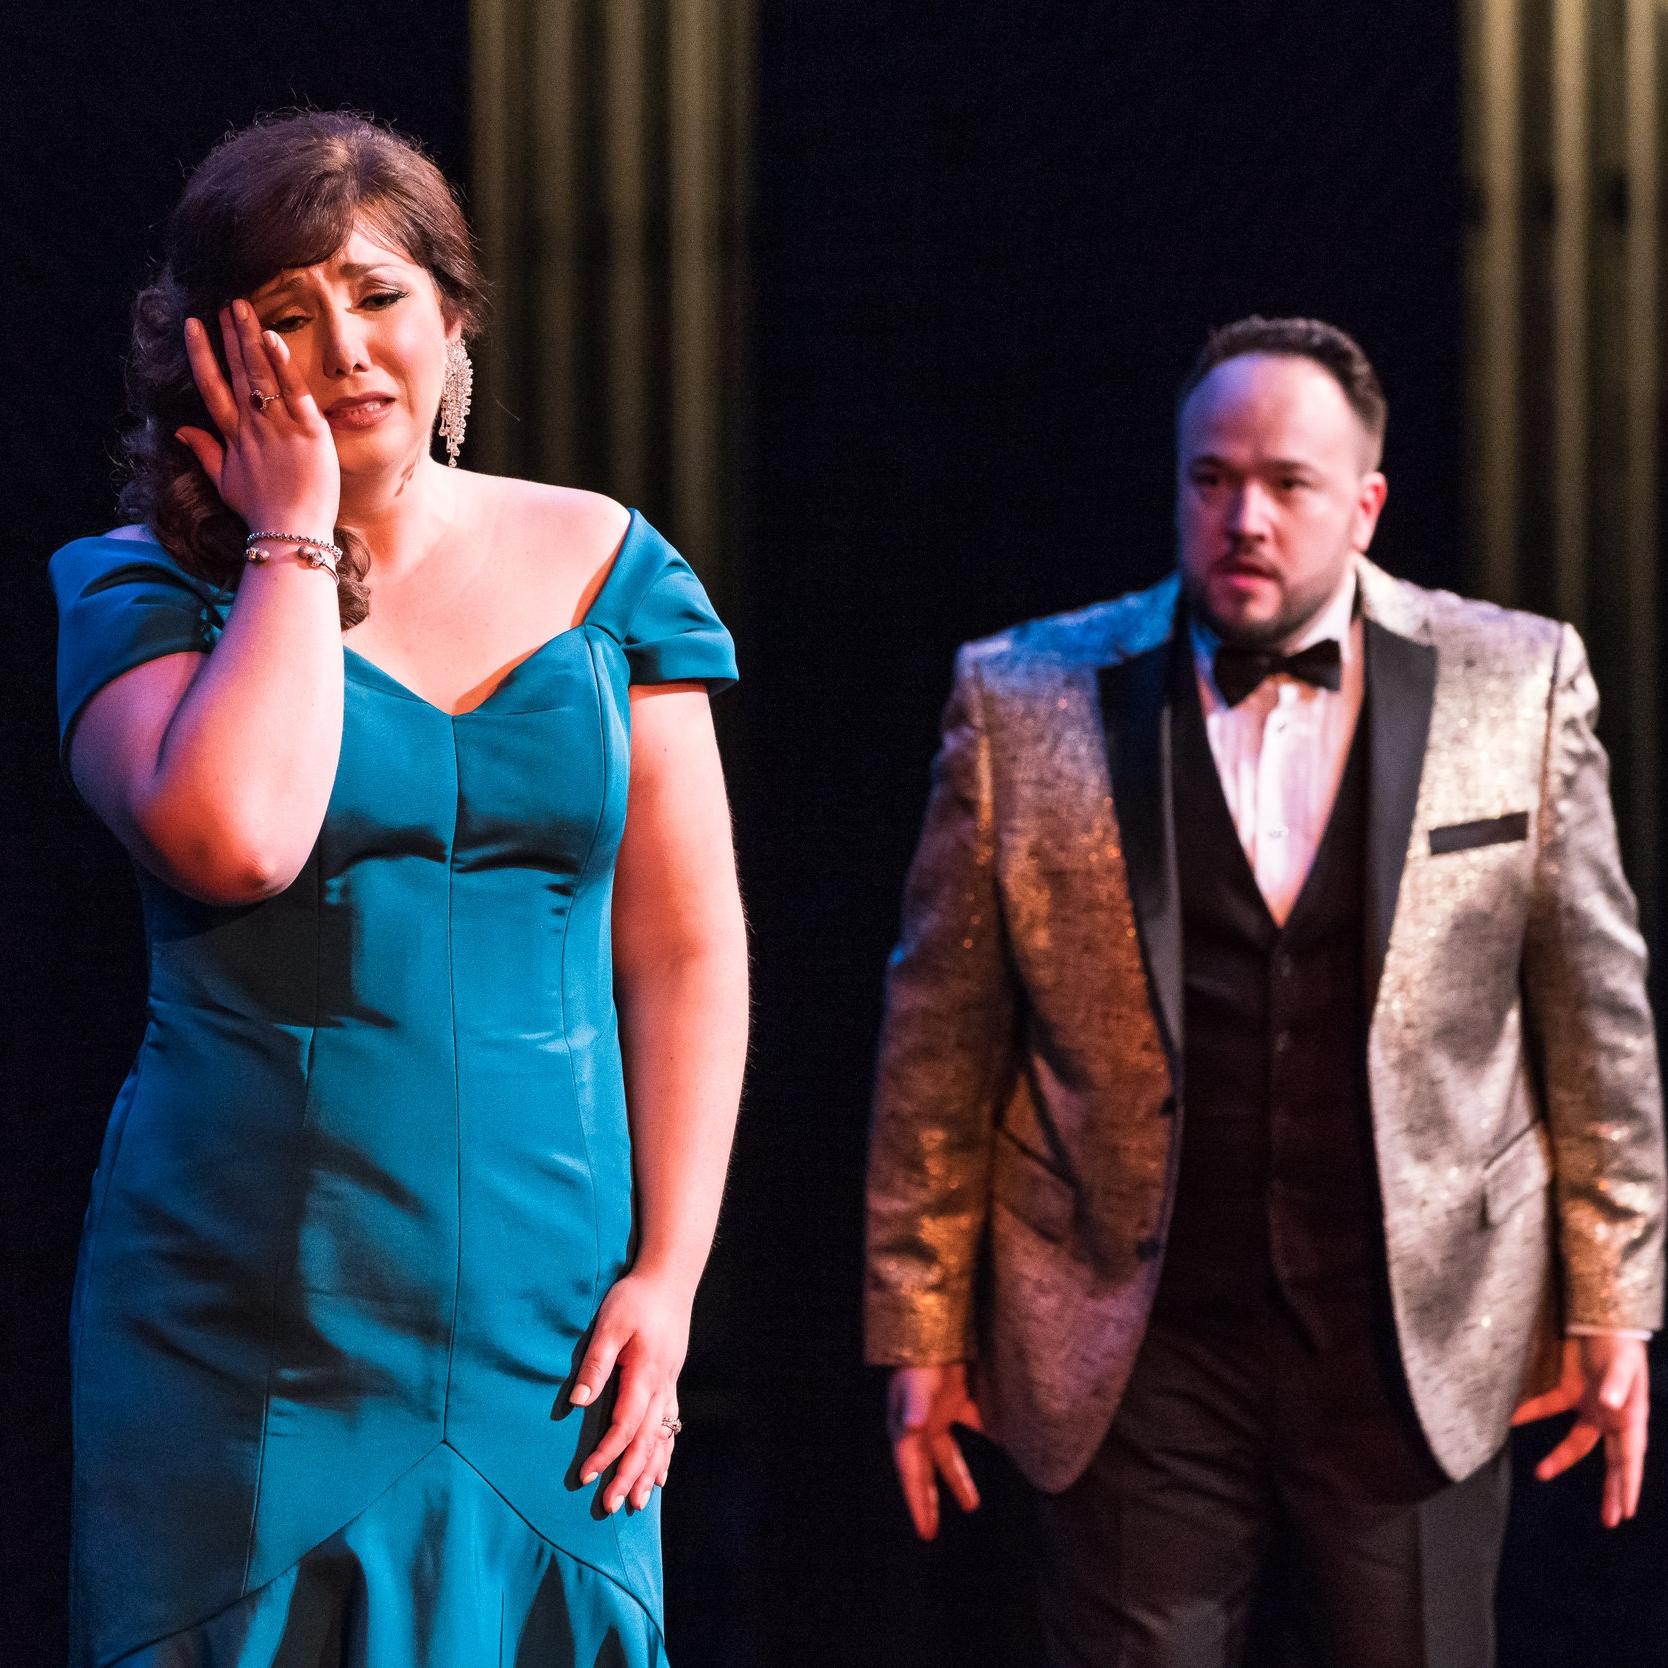 Musical America: Teatro Nuovo Opens Its Inaugural Season - August 3, 2018